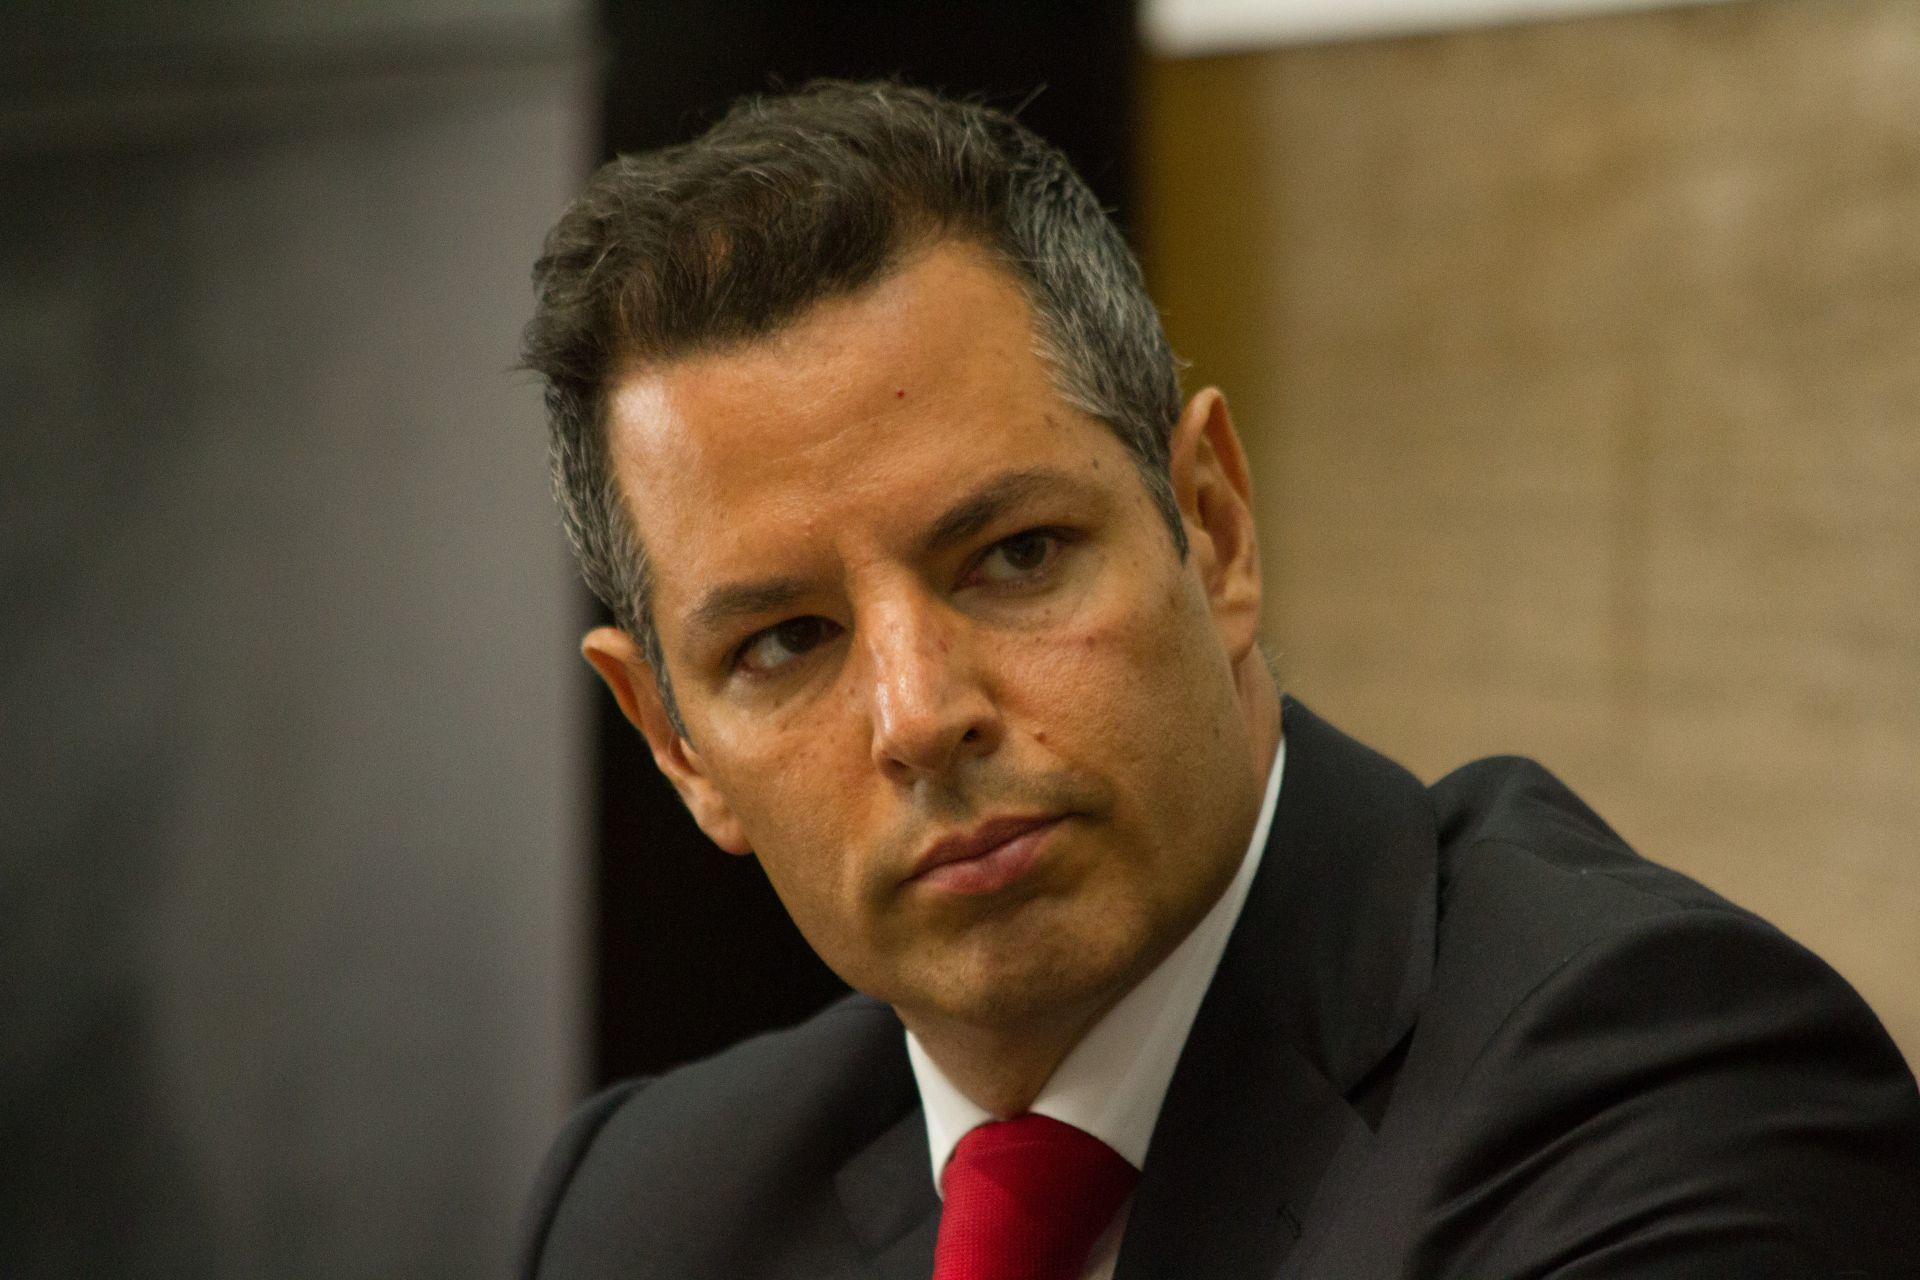 alejandro-murat-positivo-covid-19-gobernador-oaxaca